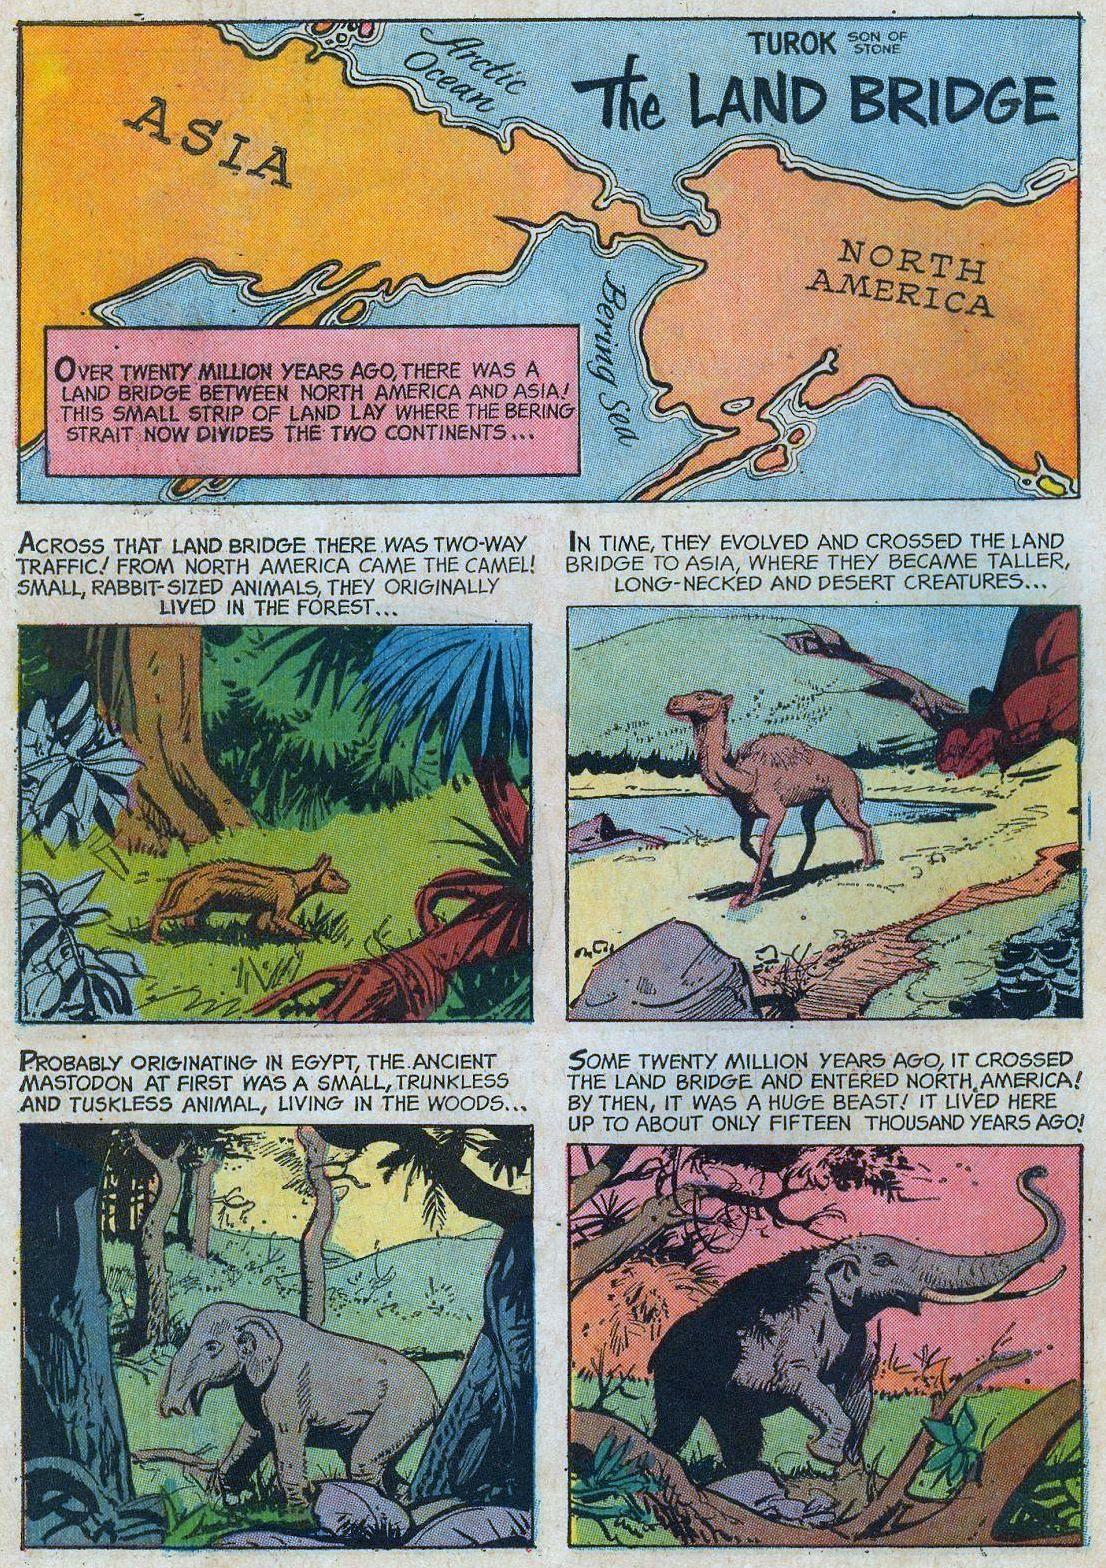 Prehistoric Mammals Of Young Earth The Land Bridge